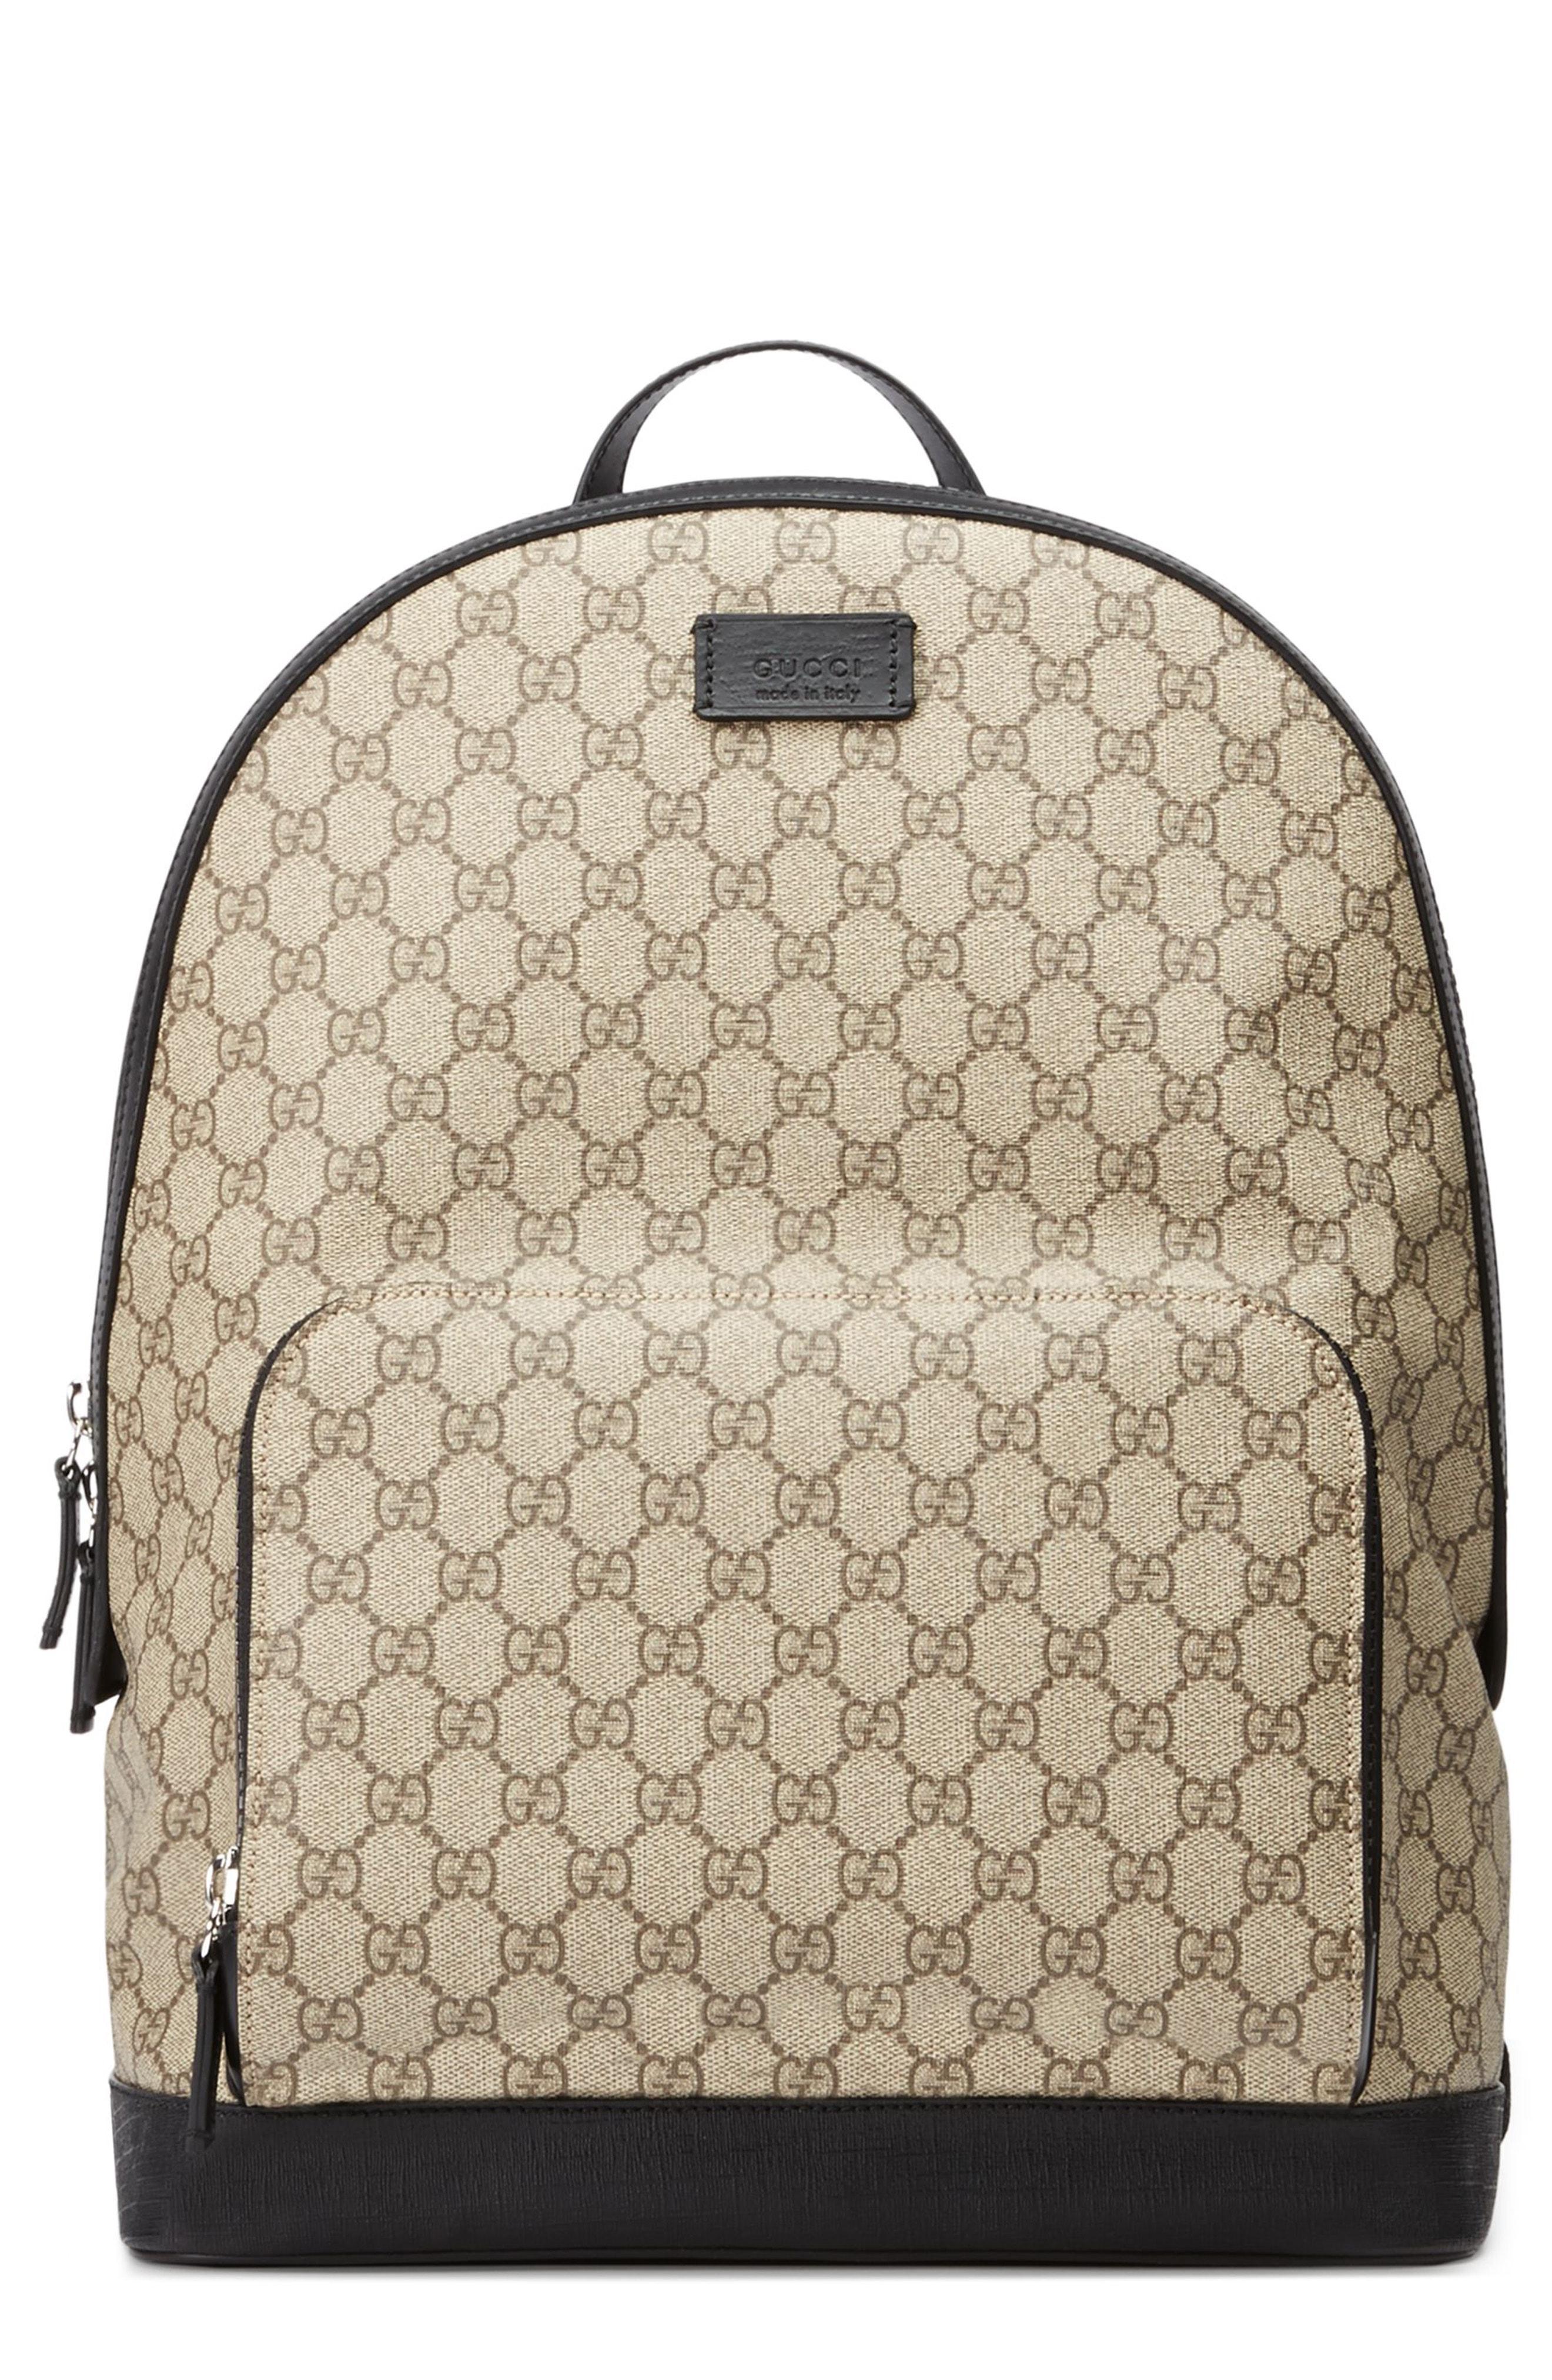 babd000c8dd Gucci Gg Supreme Print Backpack